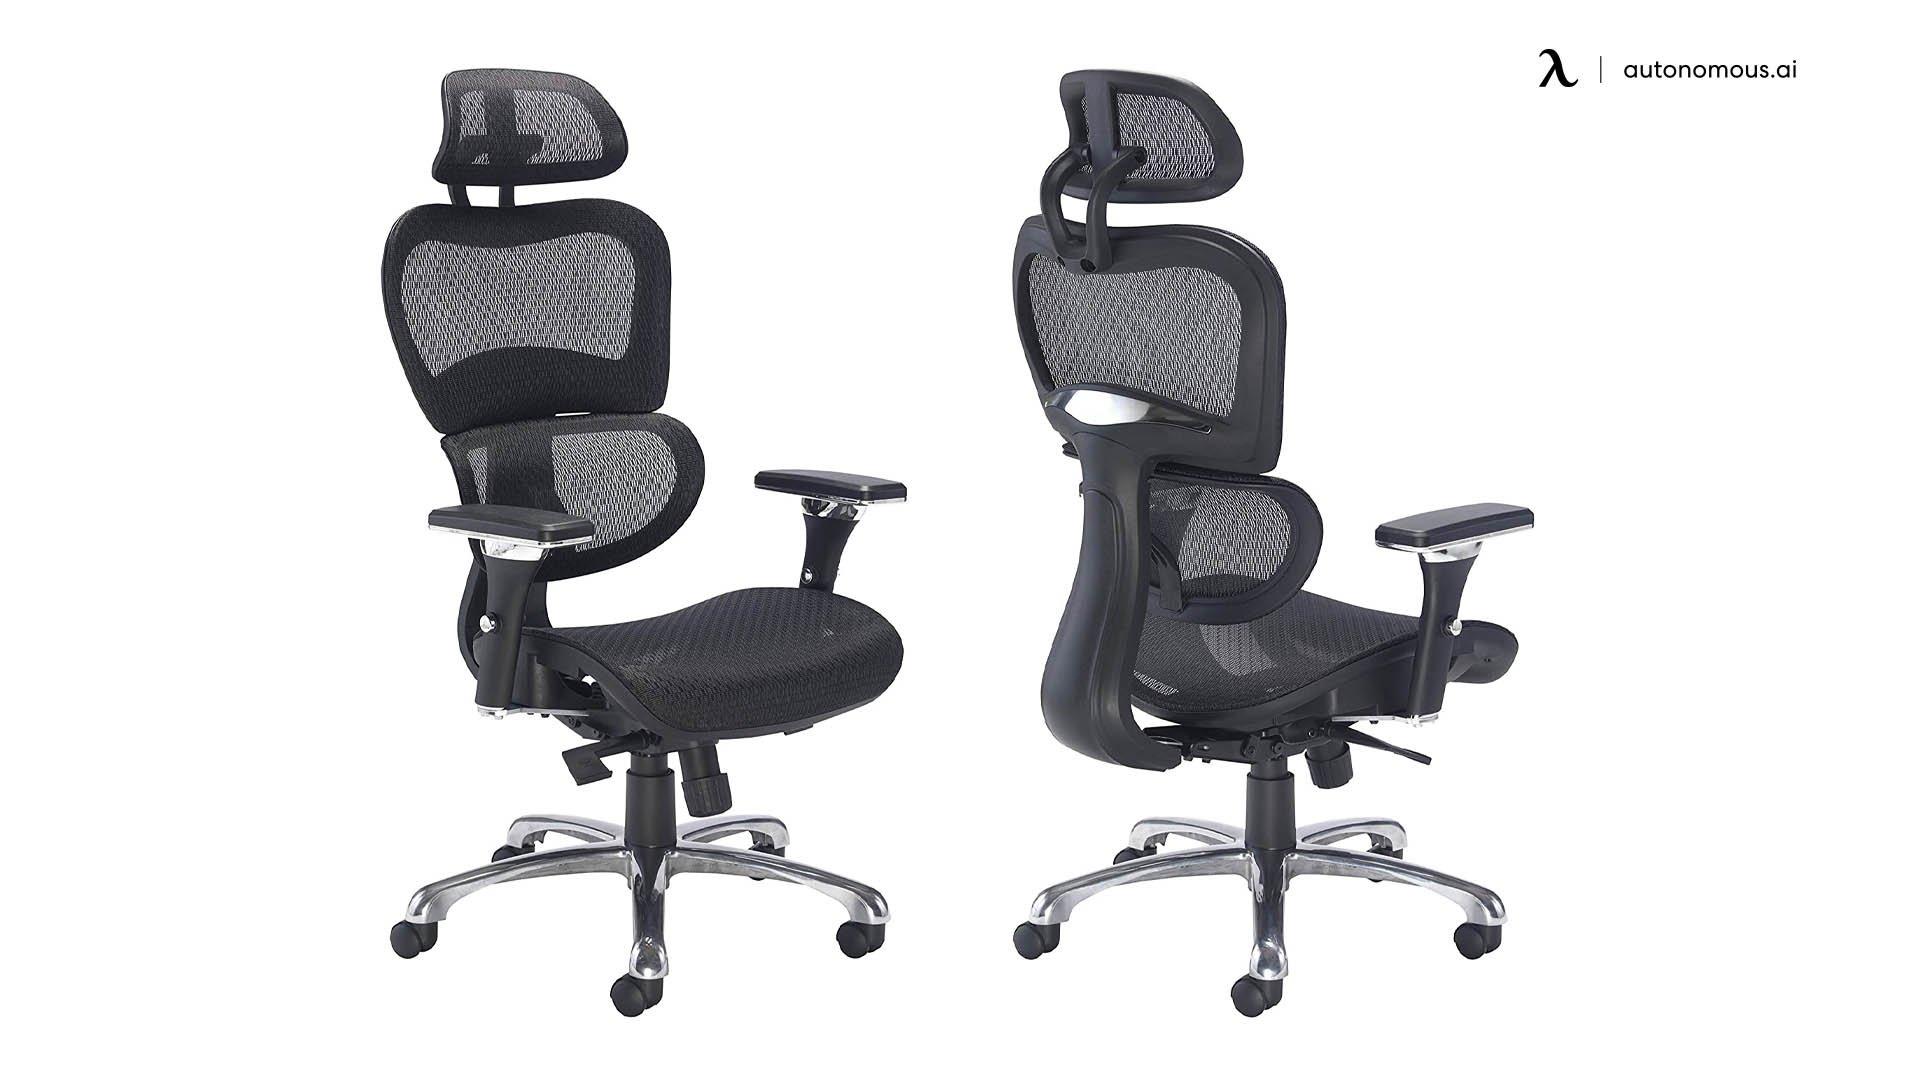 Chachi Ergonomic Chair